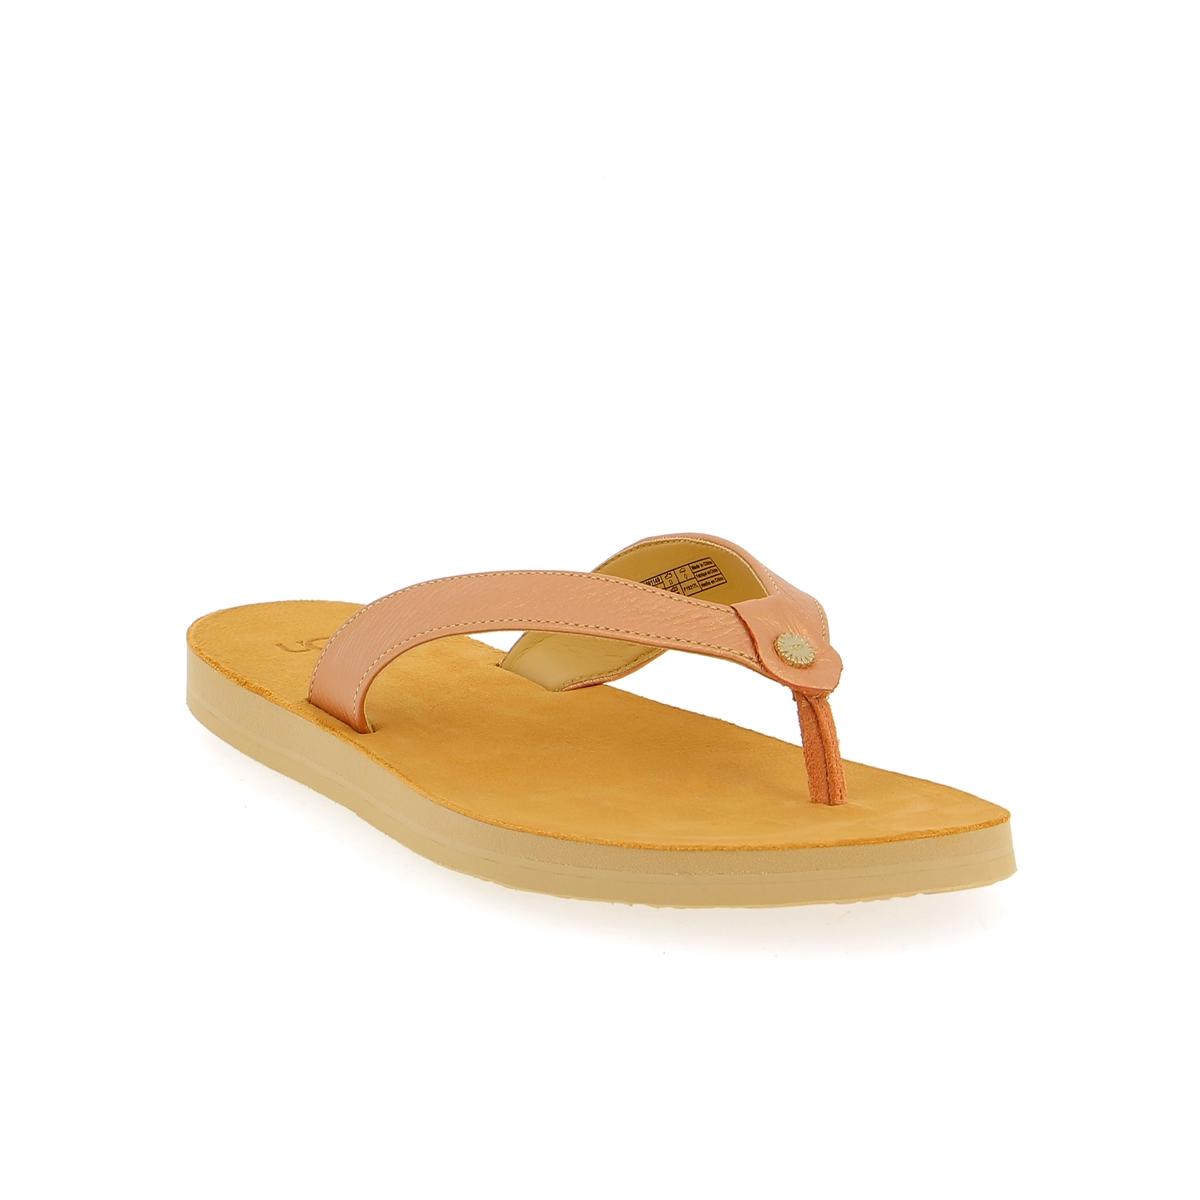 Ugg Muiltjes - slippers roze